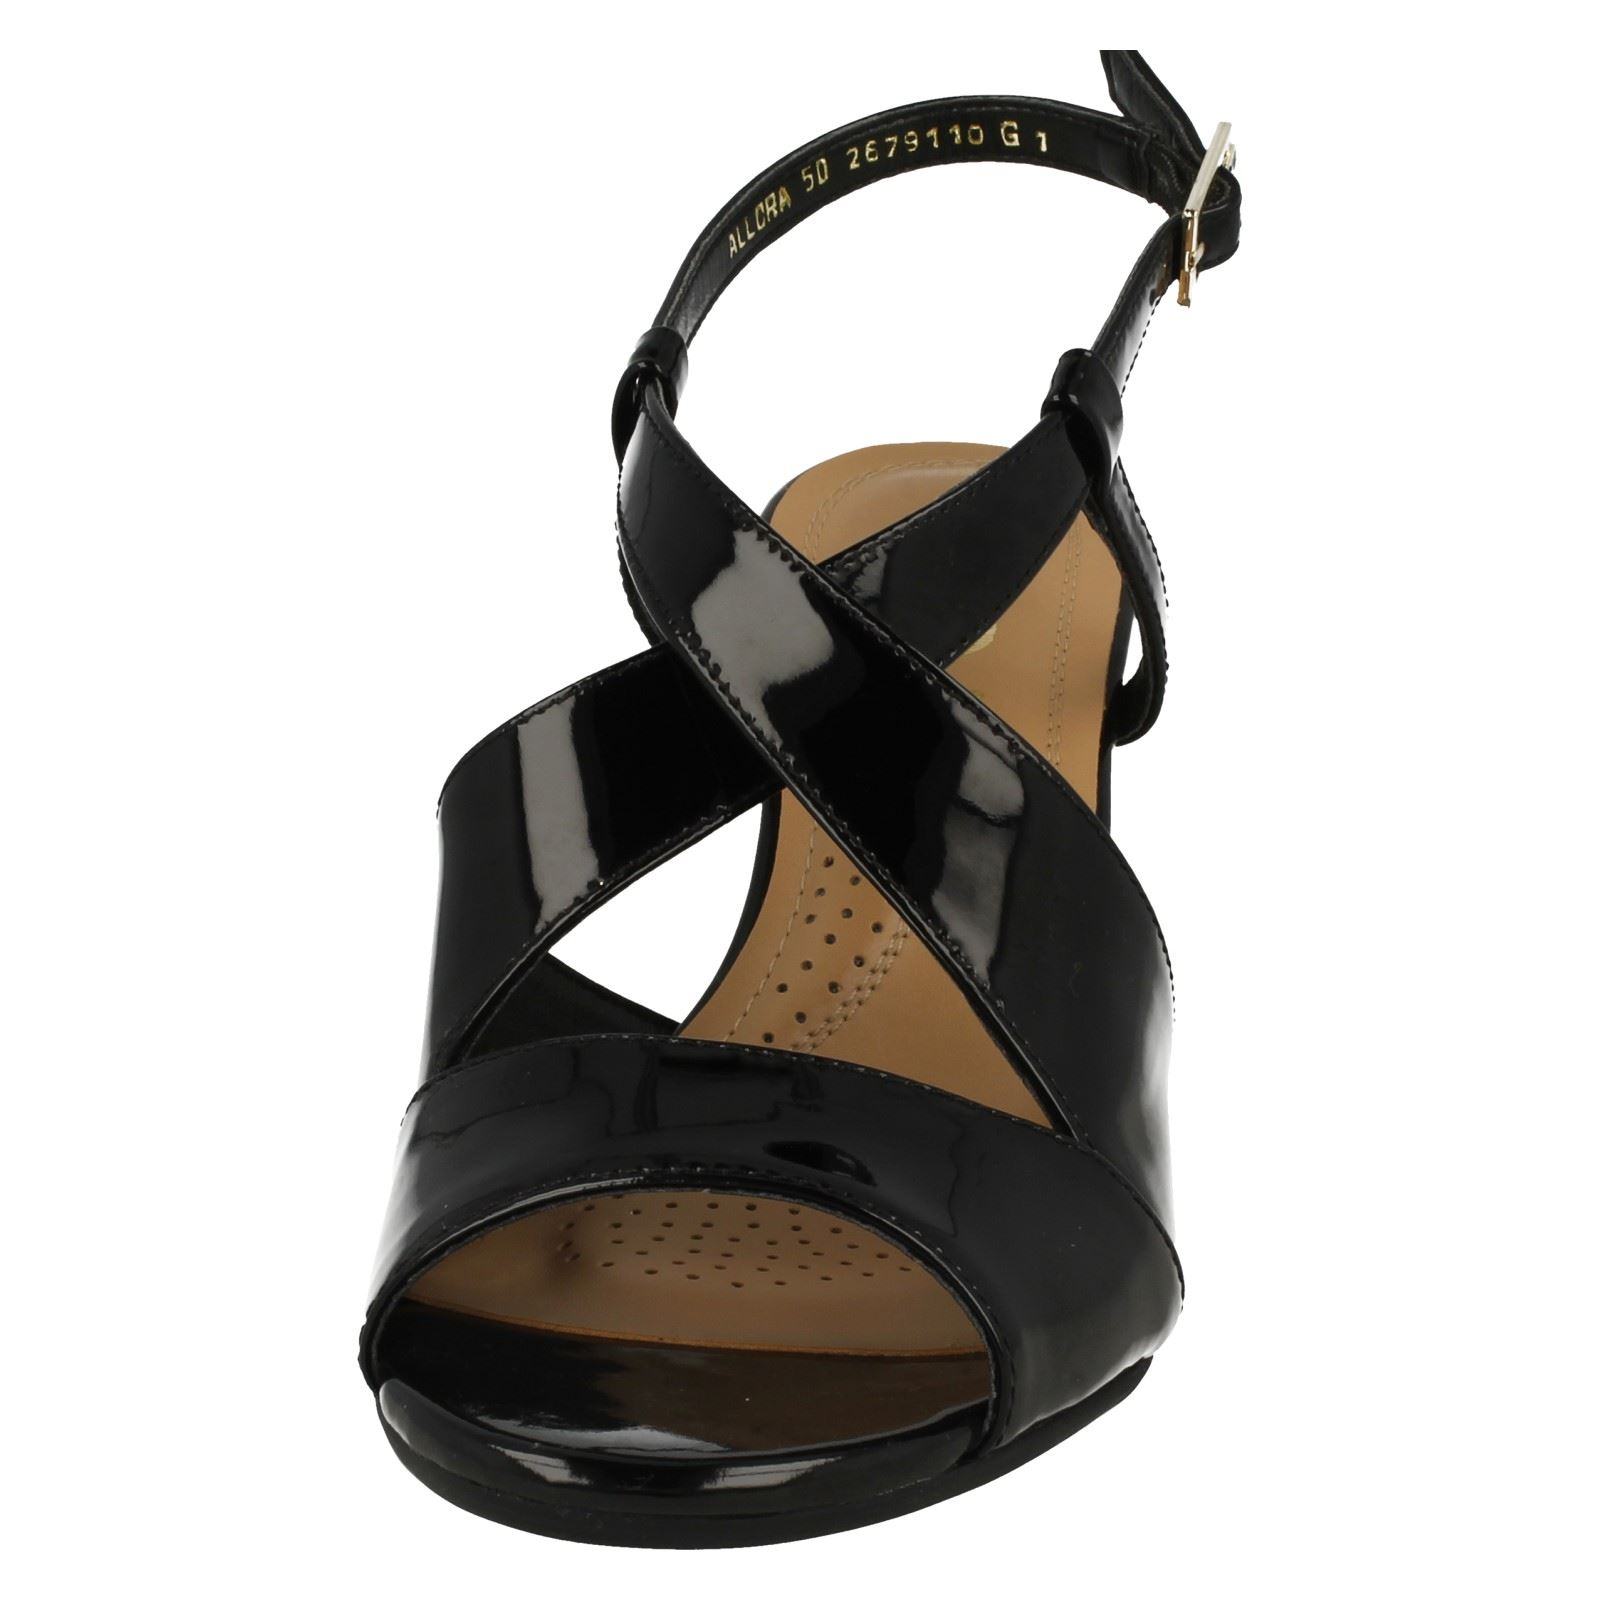 Ladies-Van-Dal-Cross-Strap-Wedged-Sandal-Allora thumbnail 18